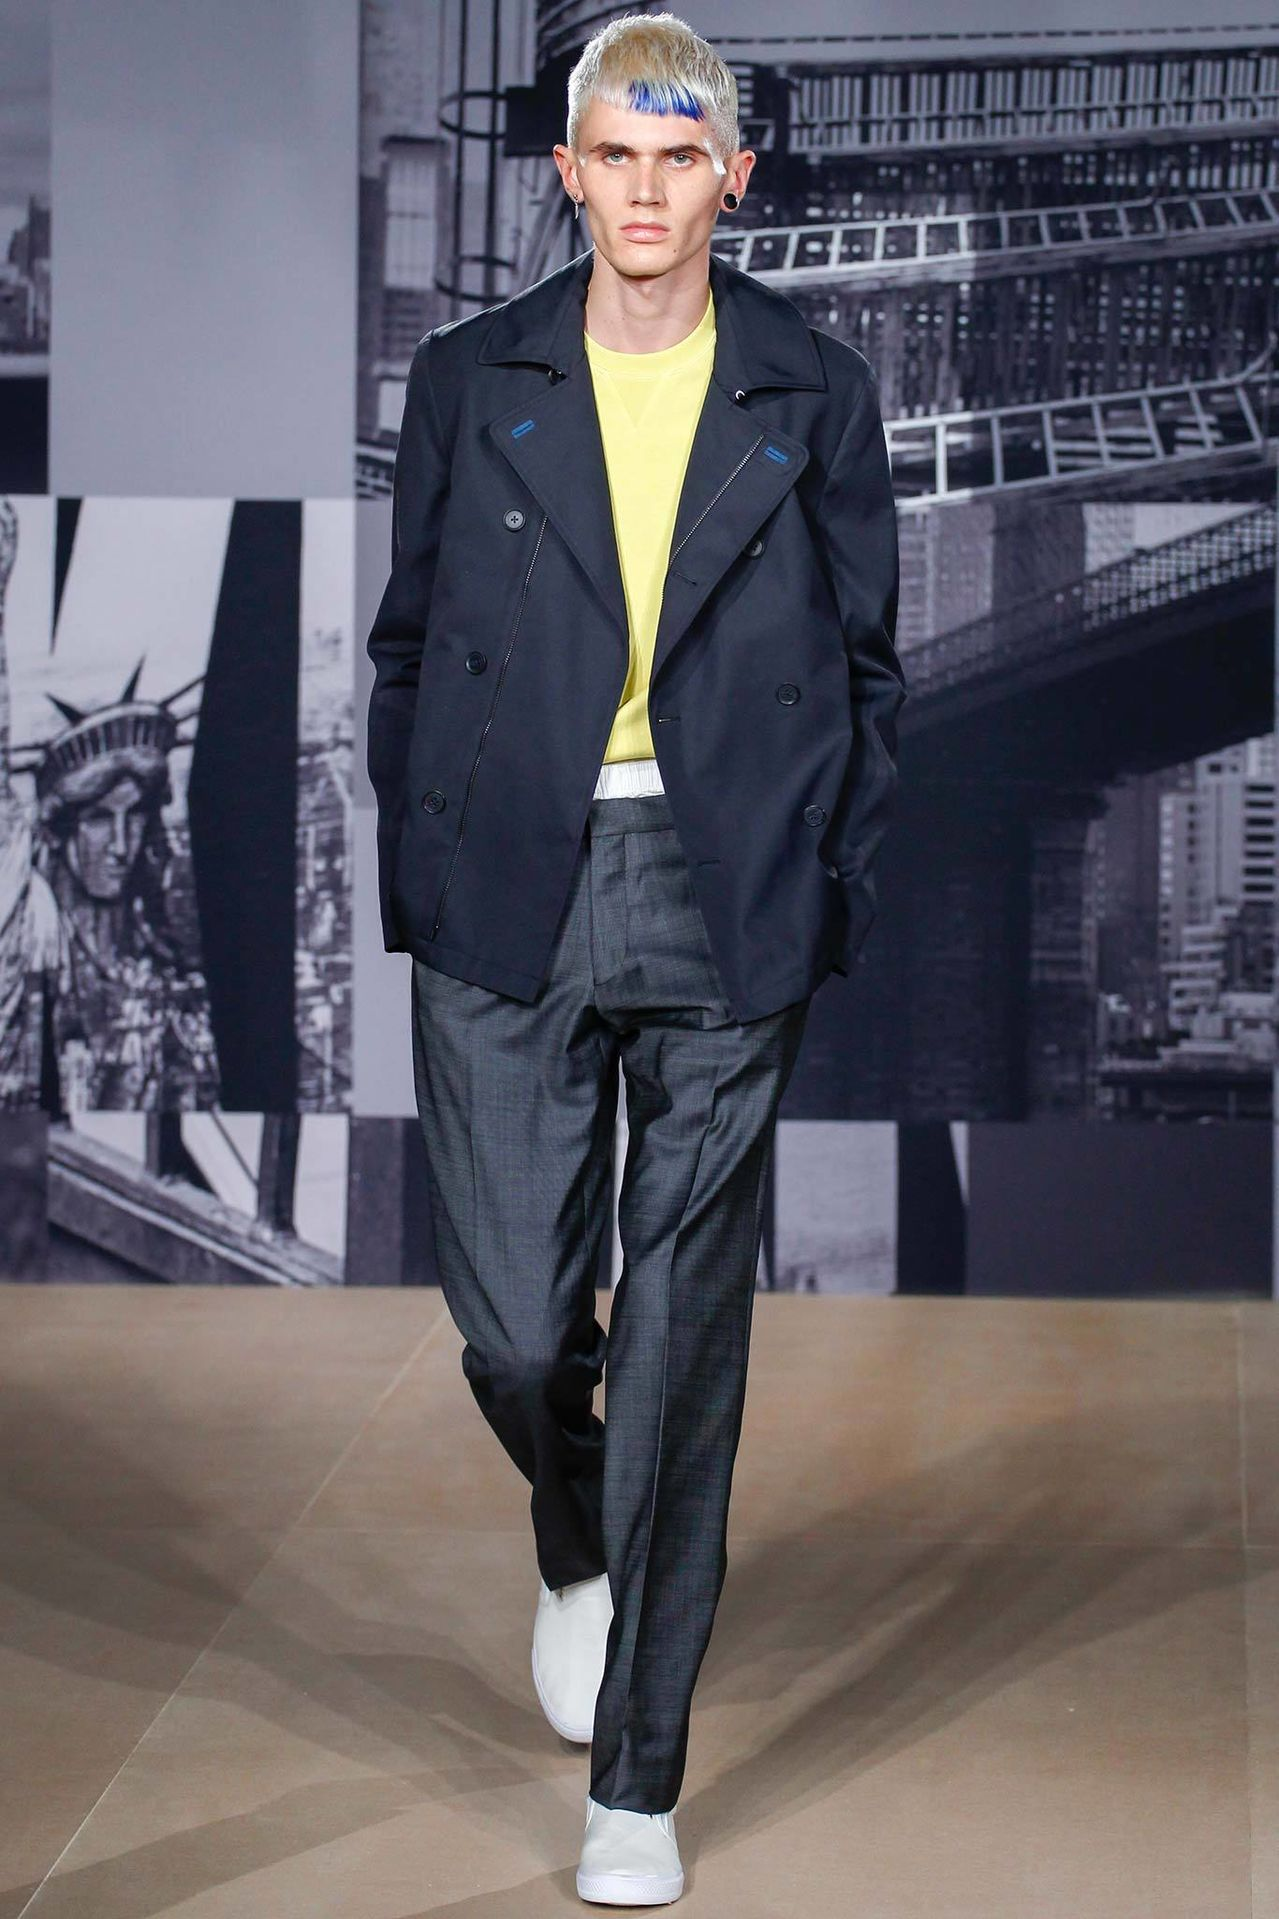 DKNY-Men-Spring-Summer-2014-Collection-007